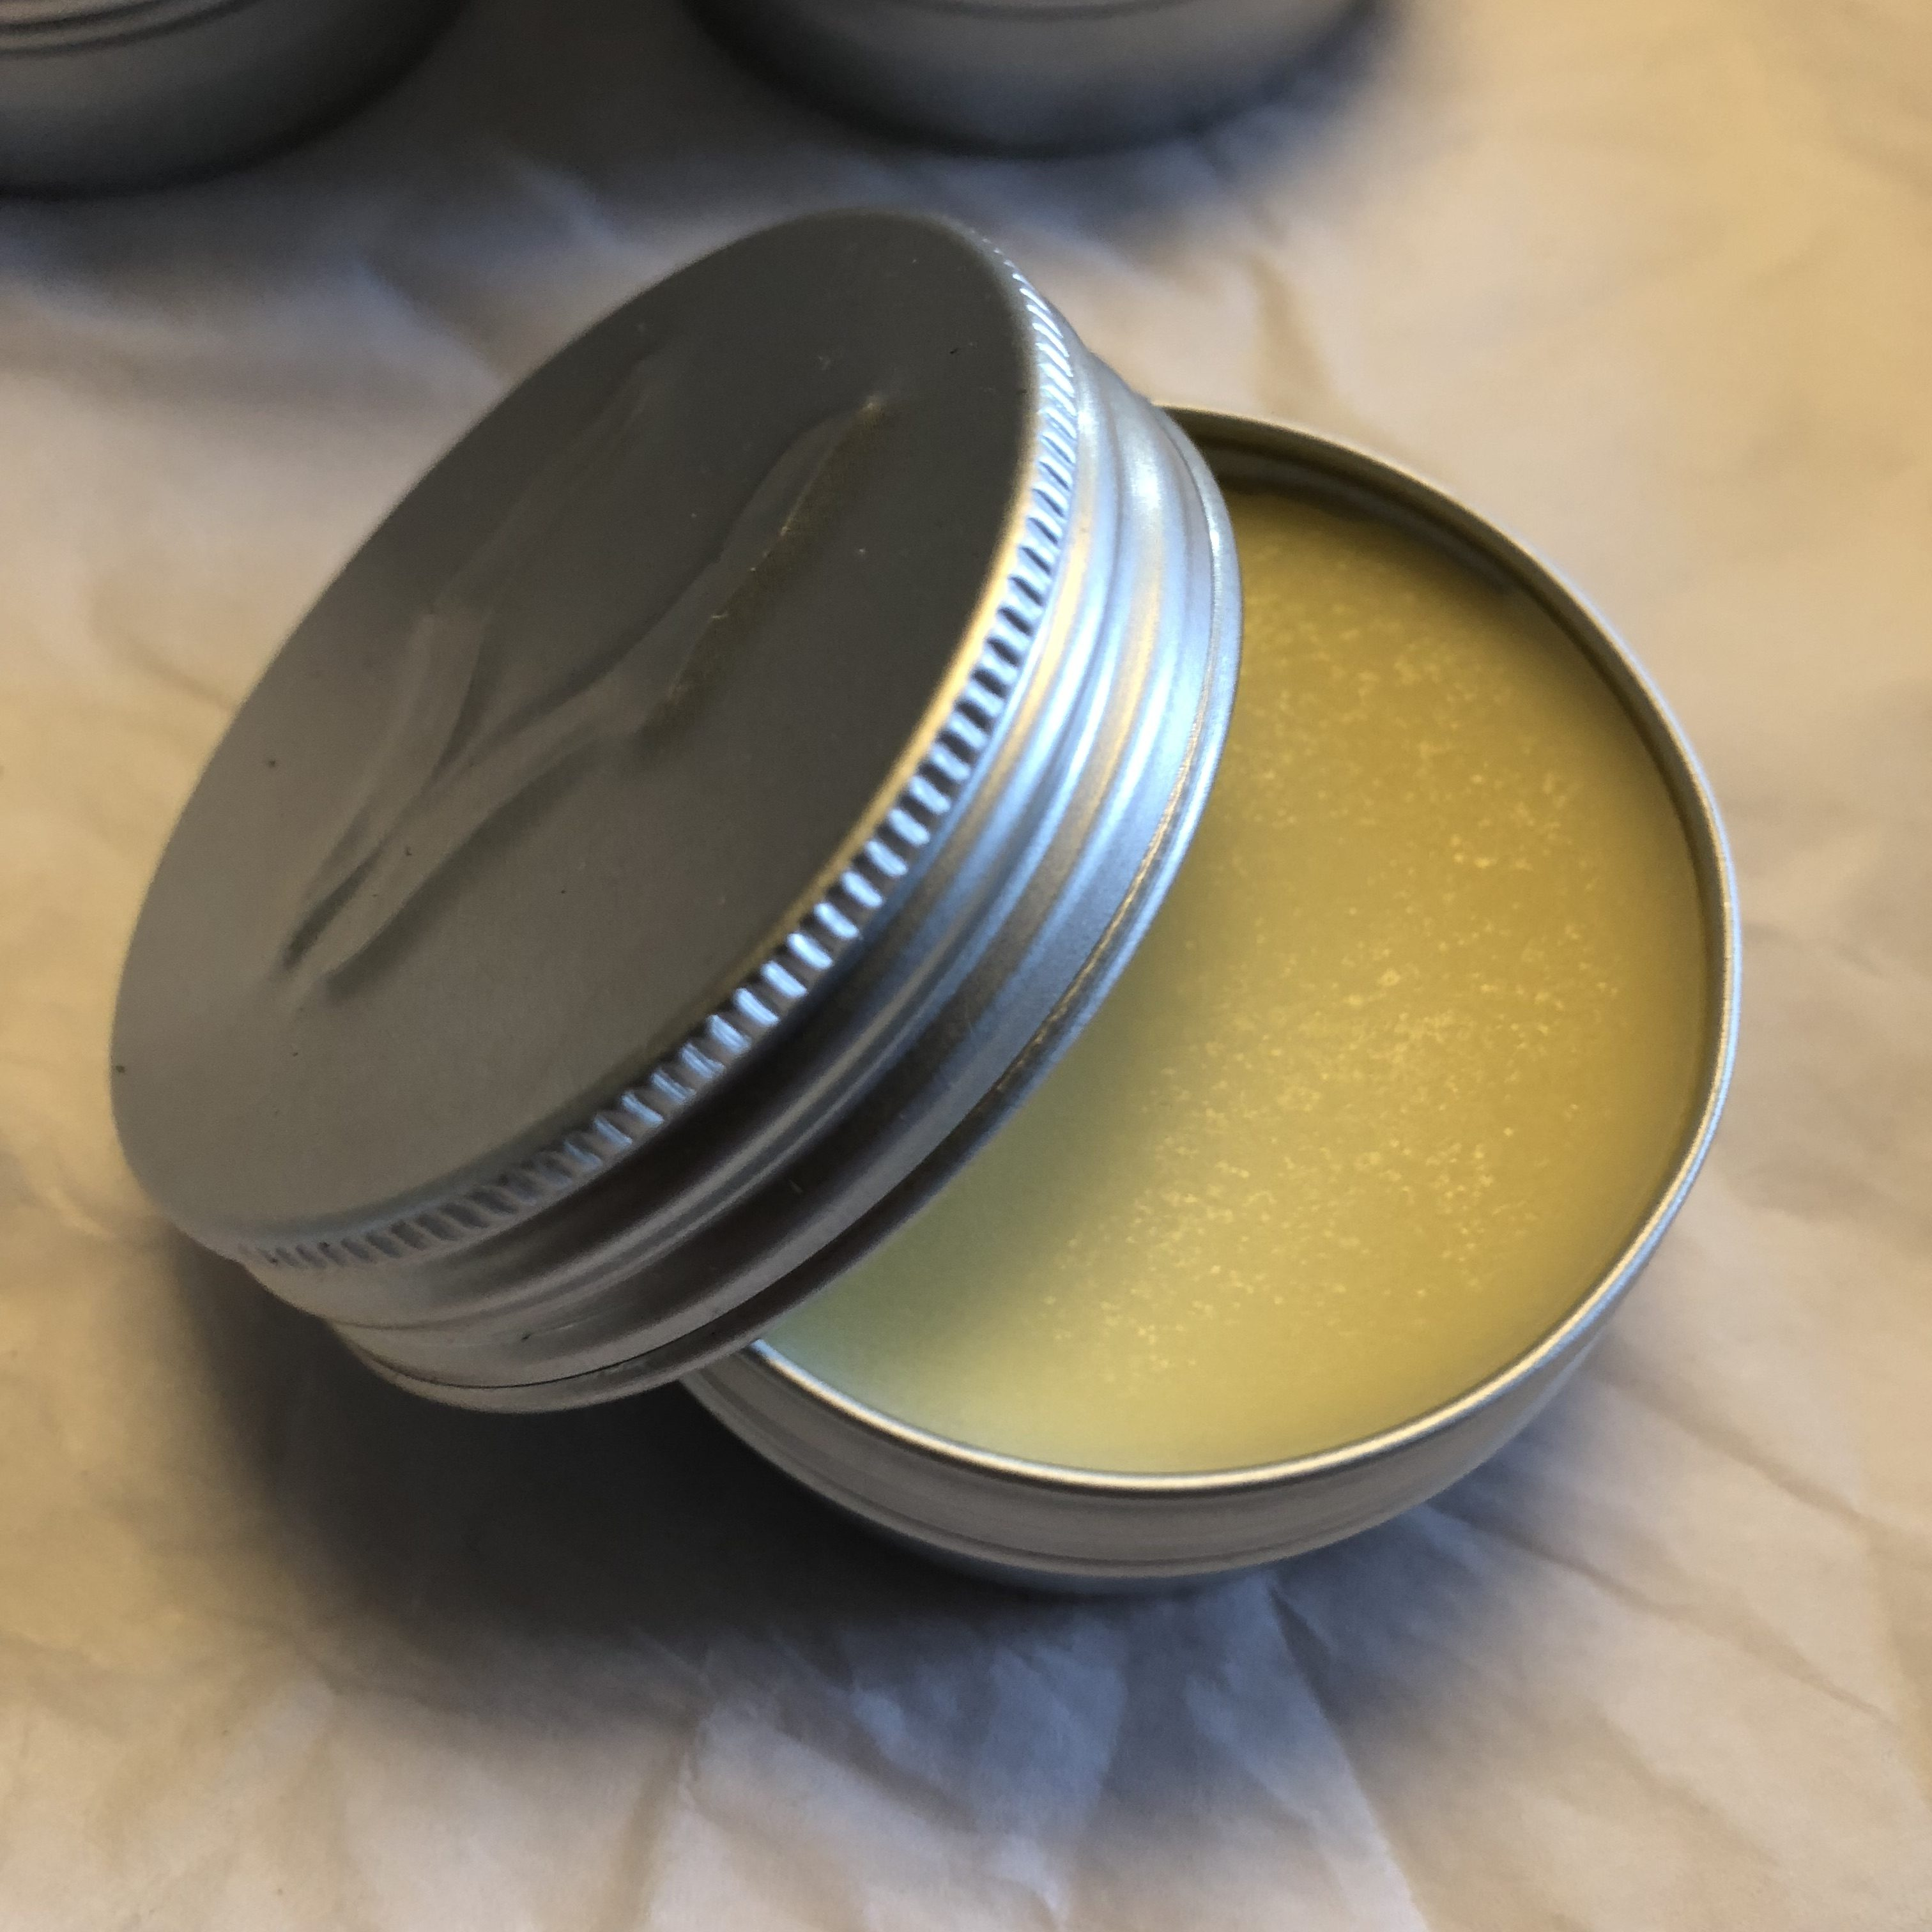 C4 Protective Skin Balm